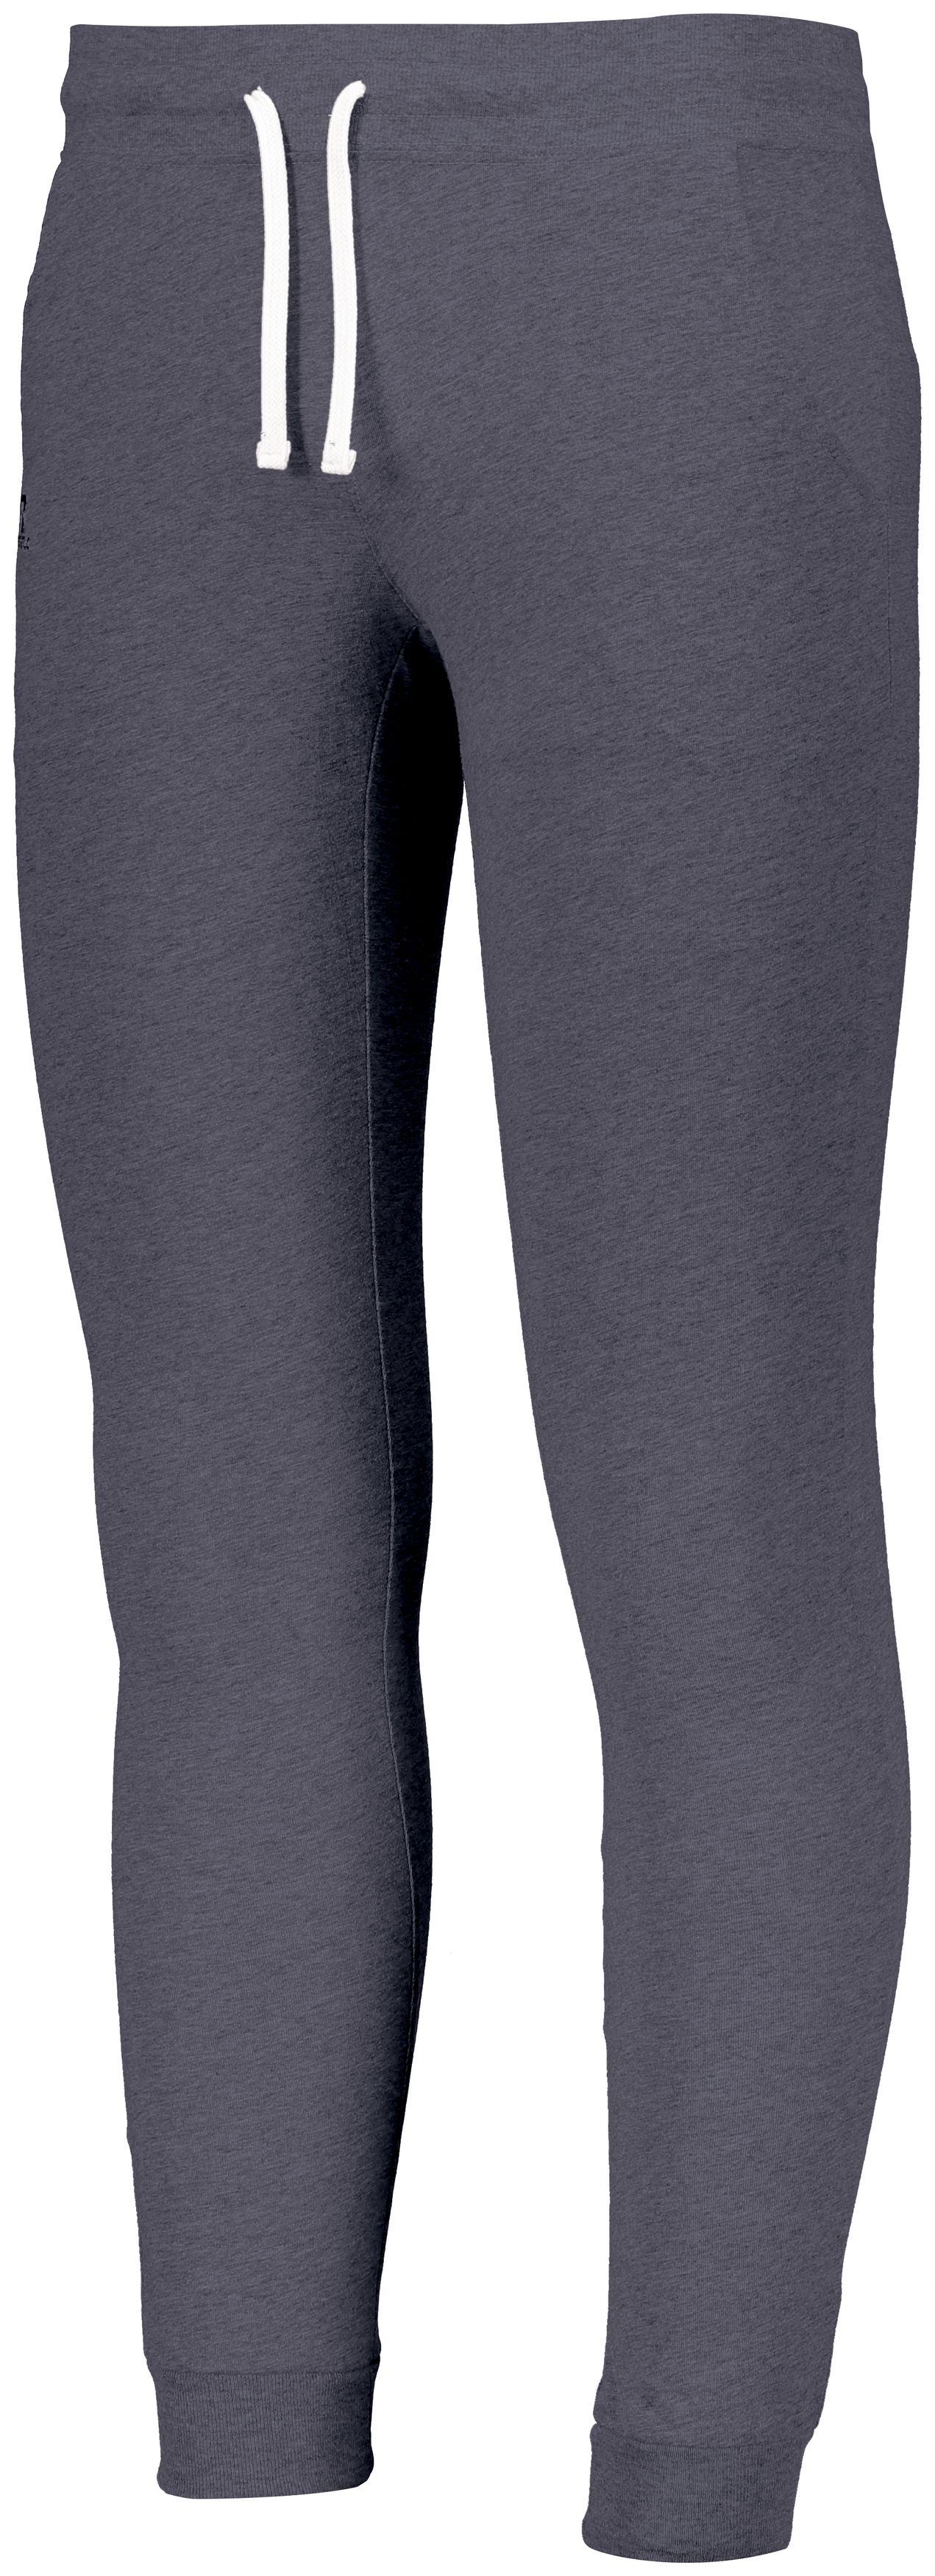 Ladies Essential Lightweight Jogger - Black Heather